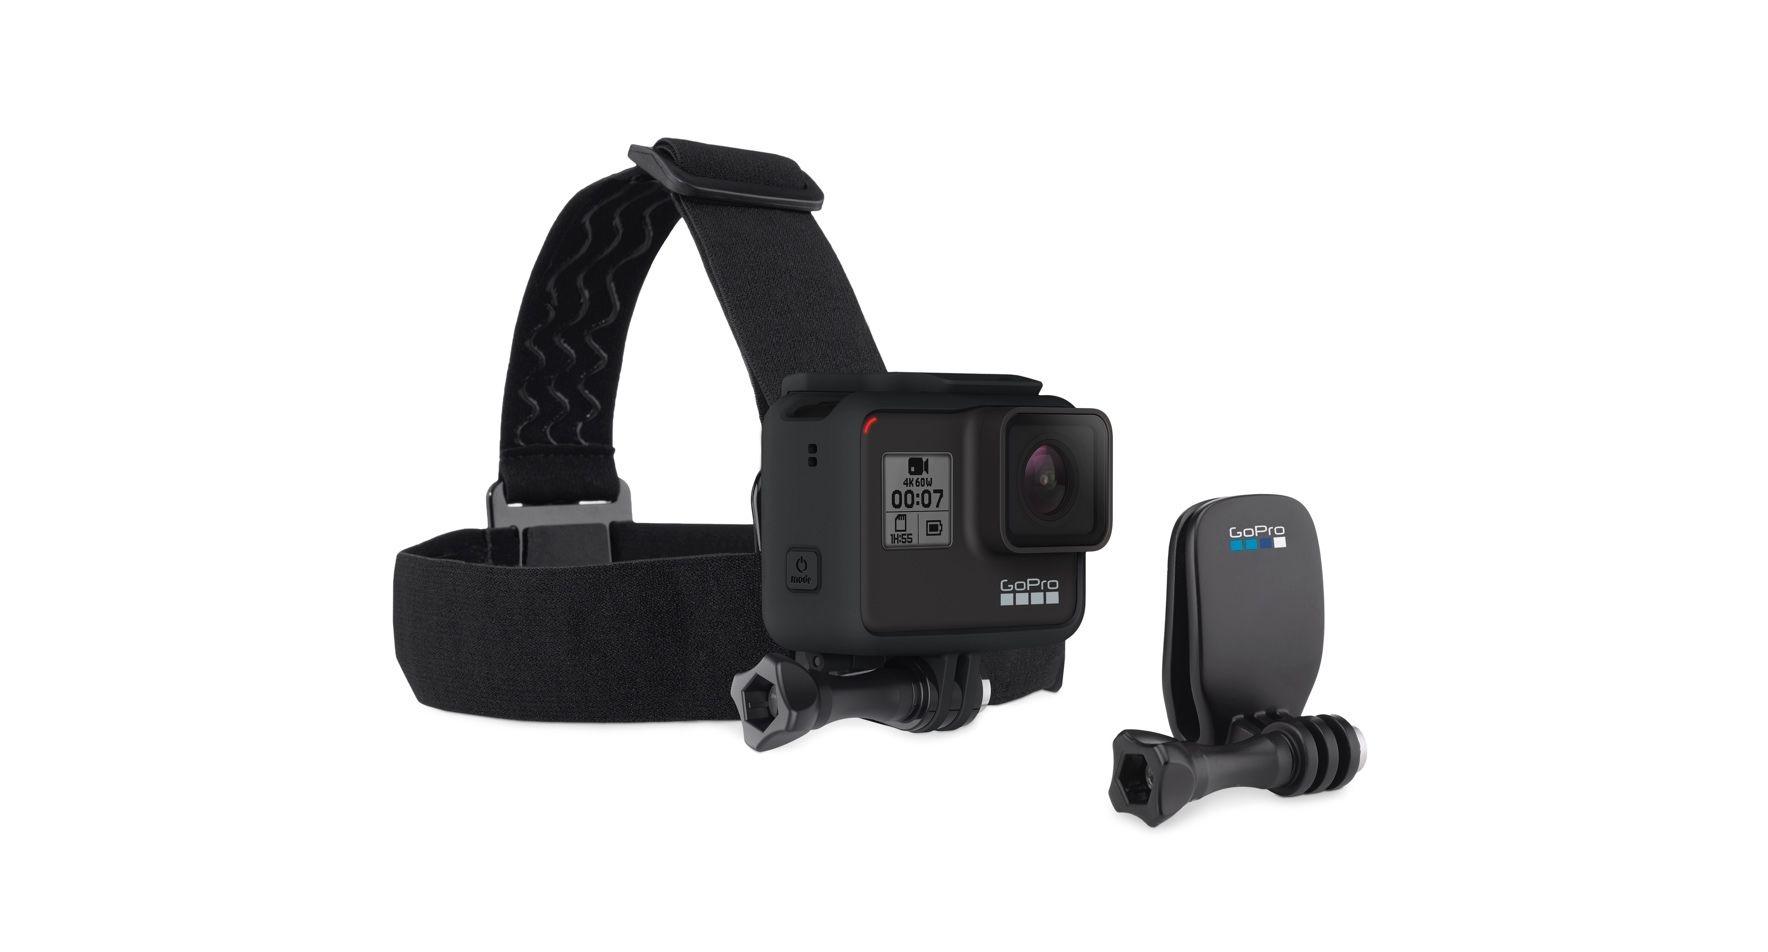 GoPro GoPro Head Strap + Quick Clip